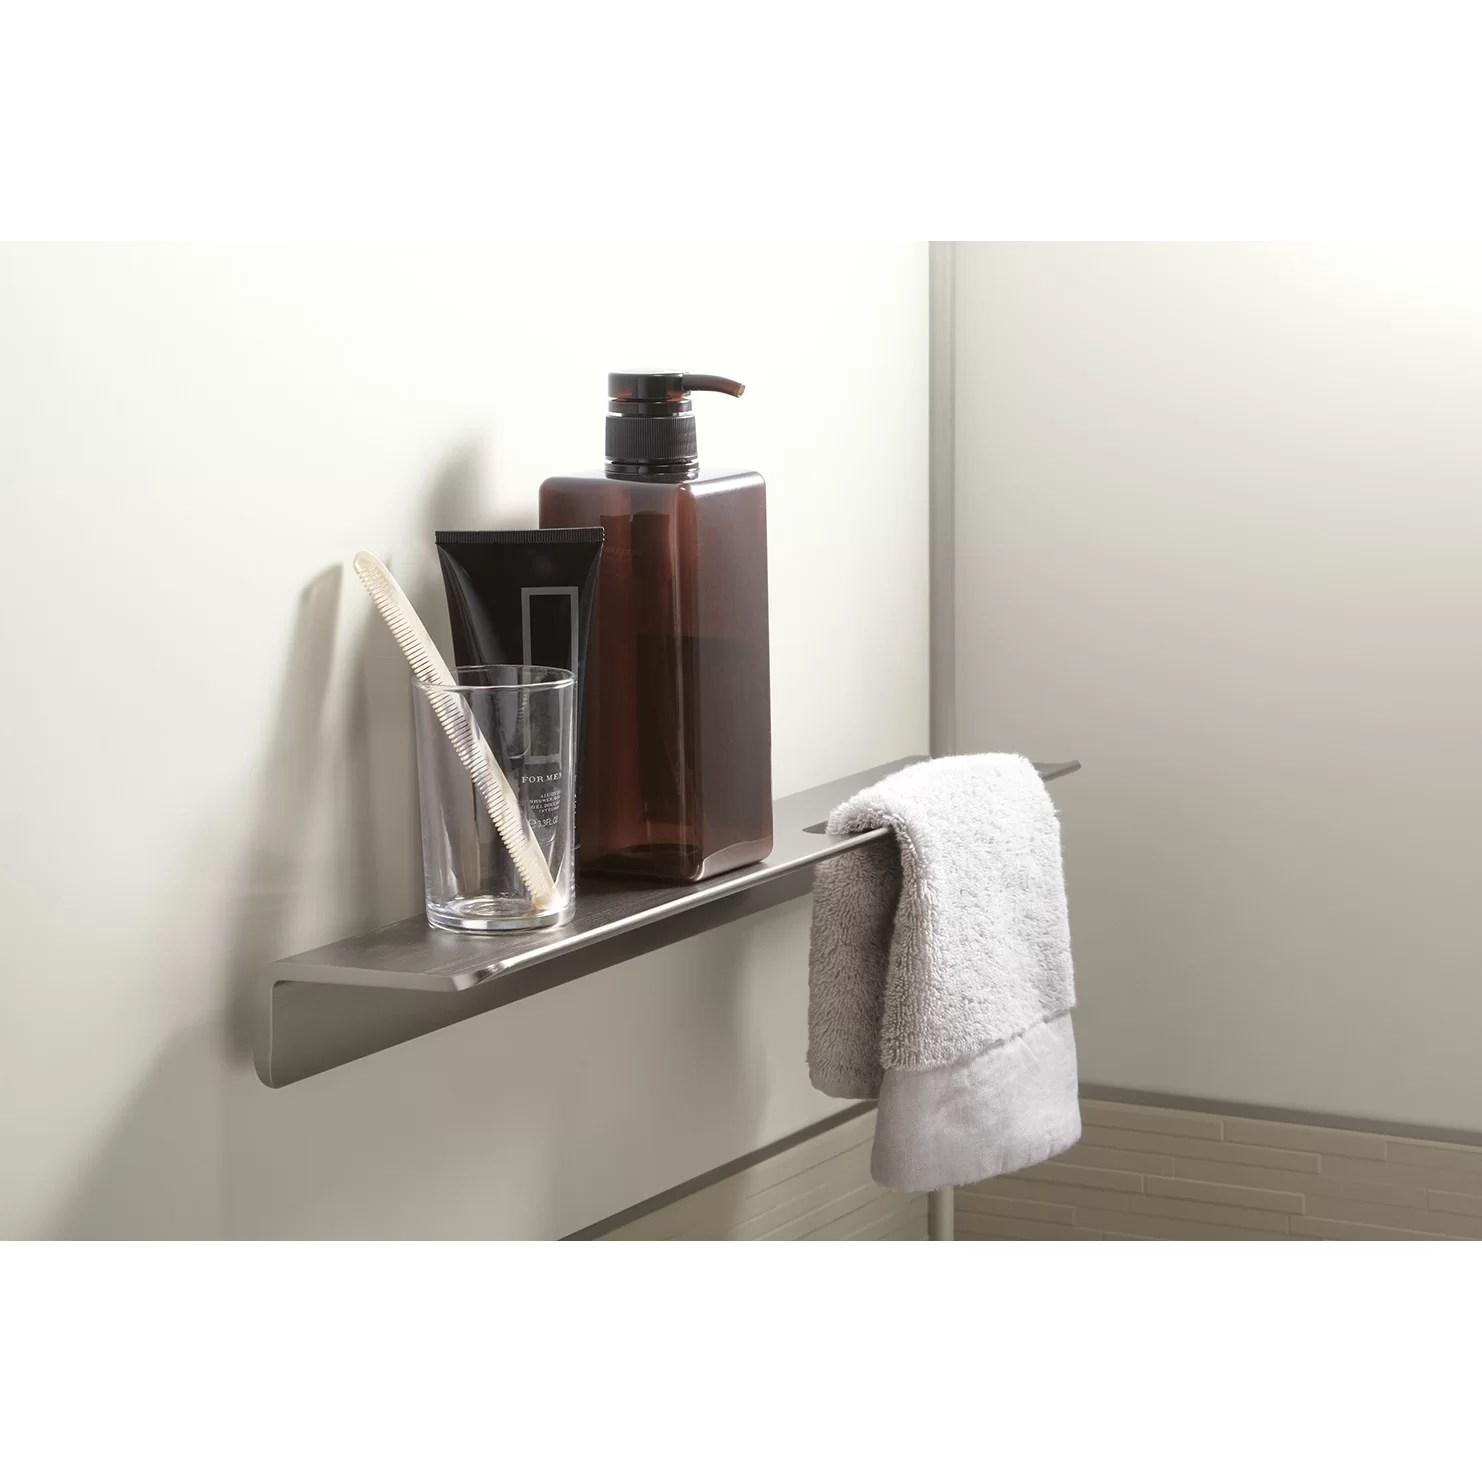 Bathroom Decor Essentials